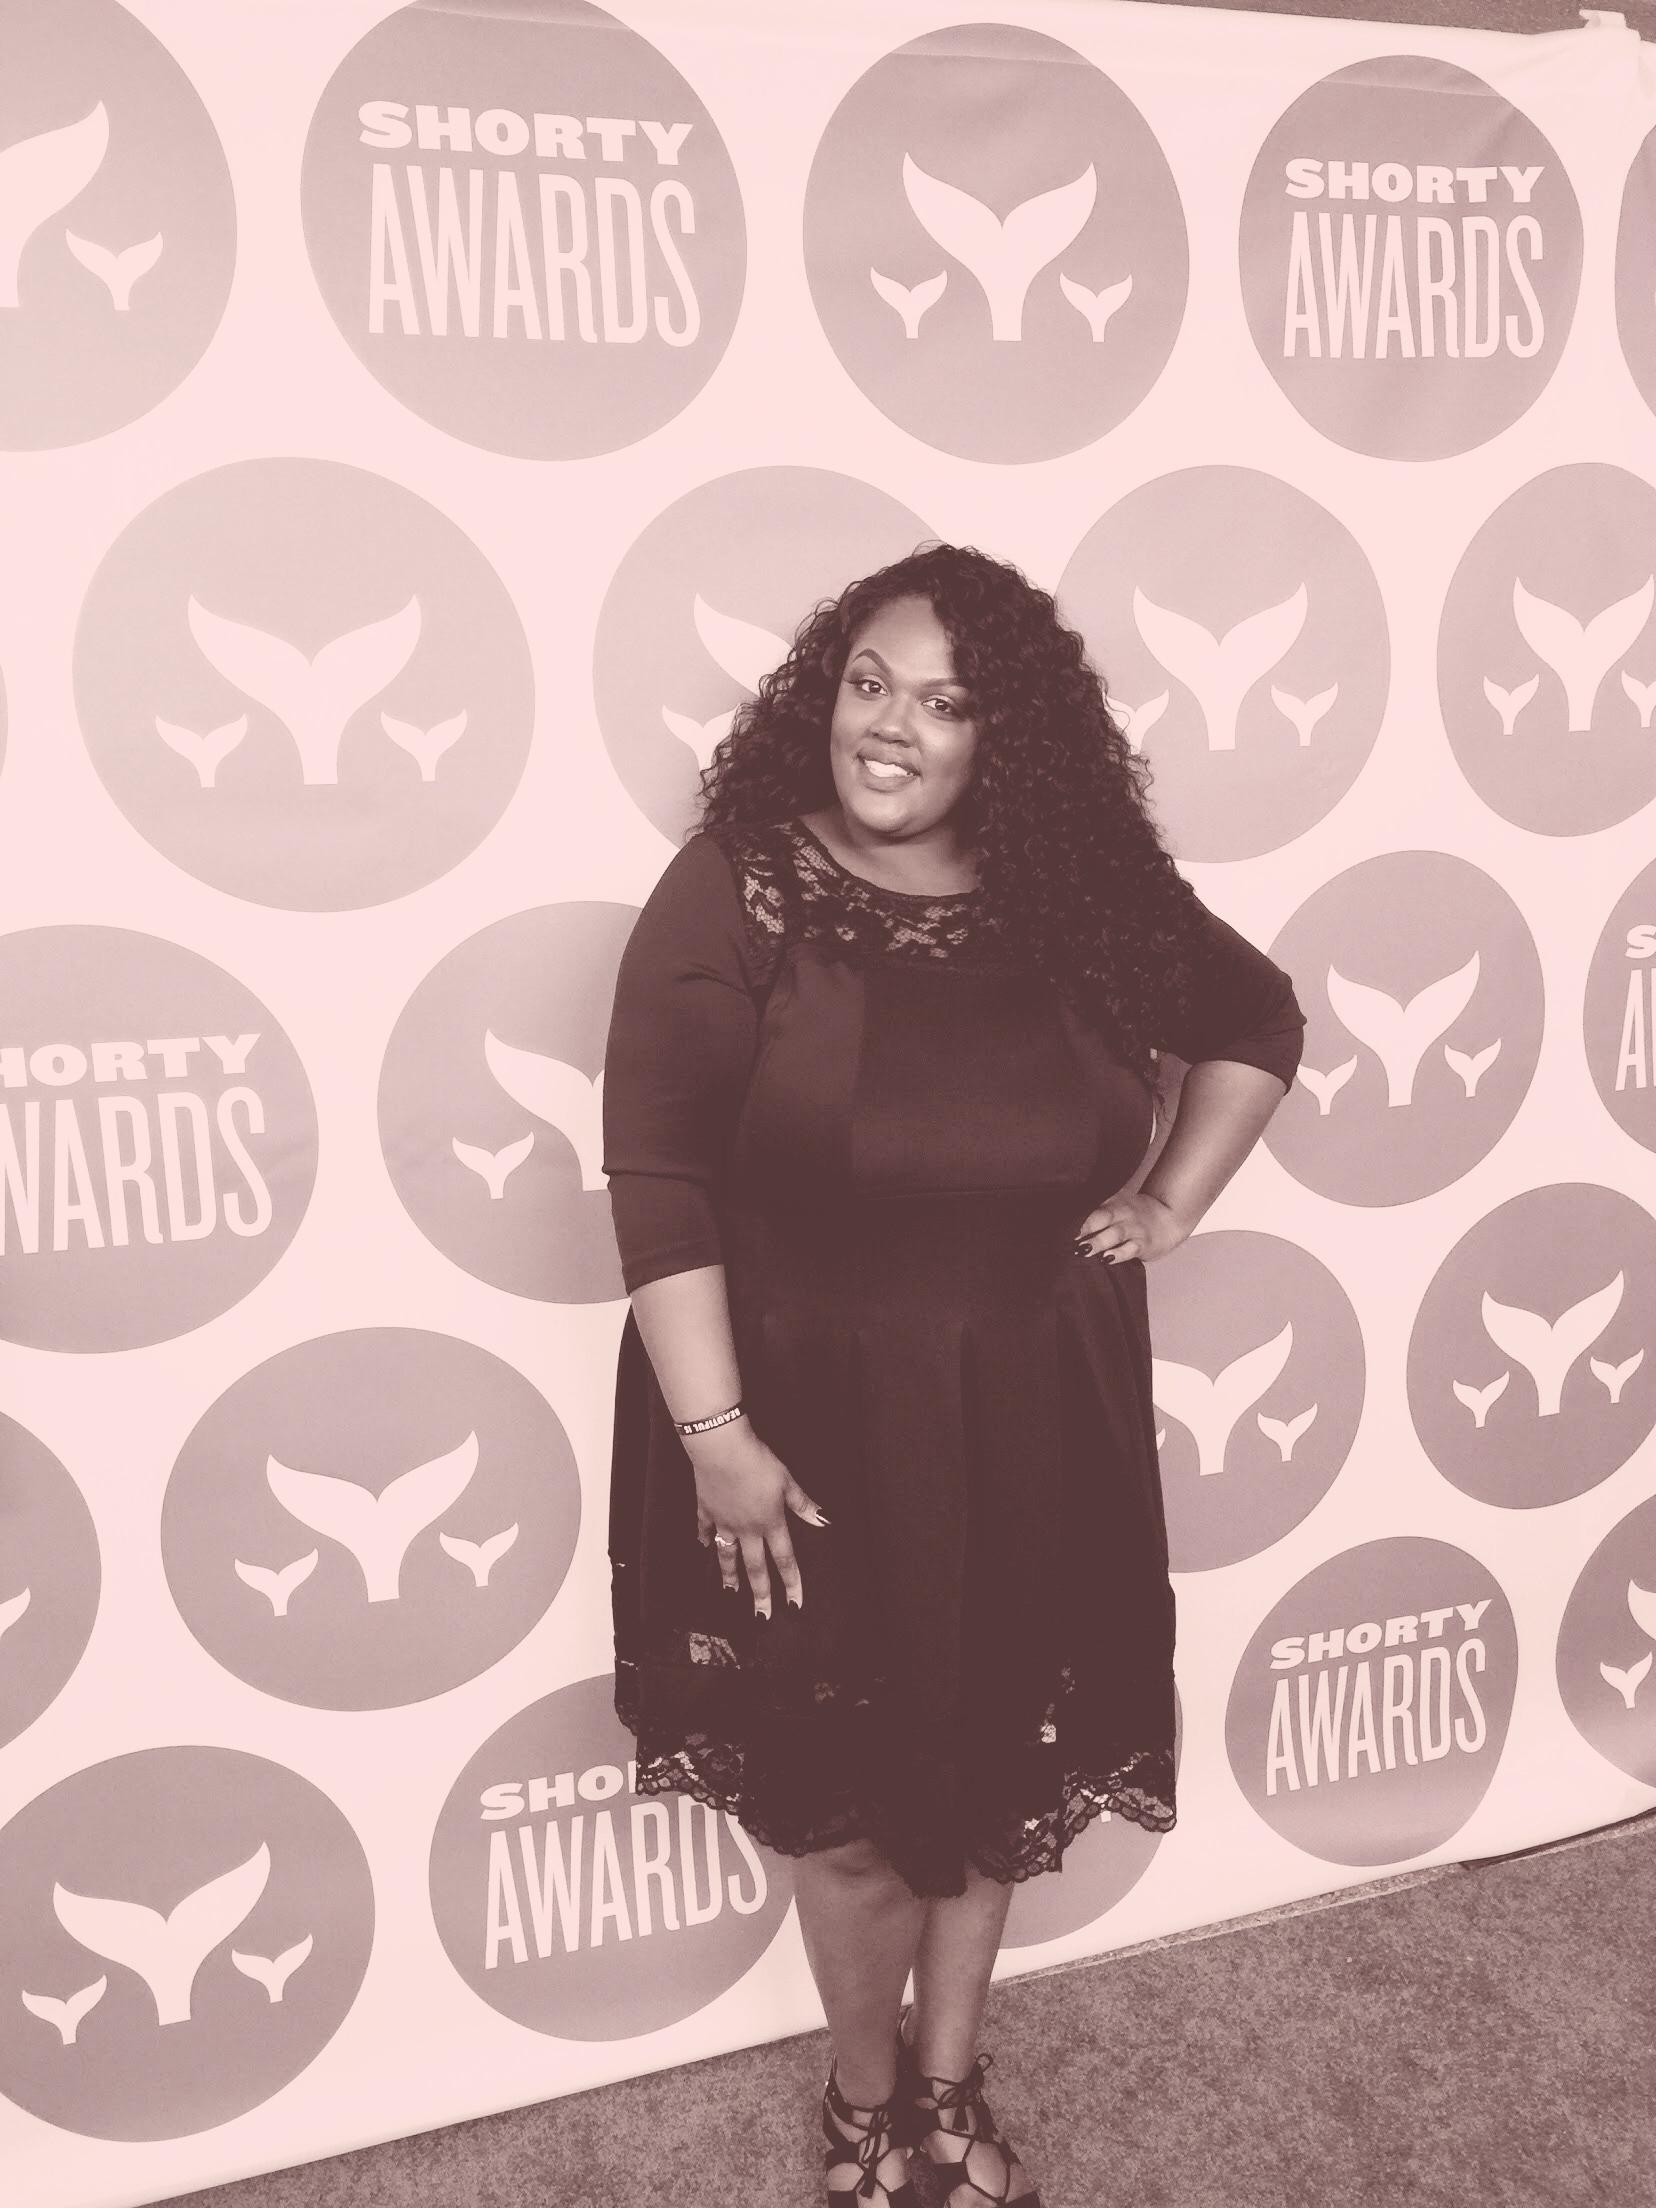 The Shorty Awards.JPG